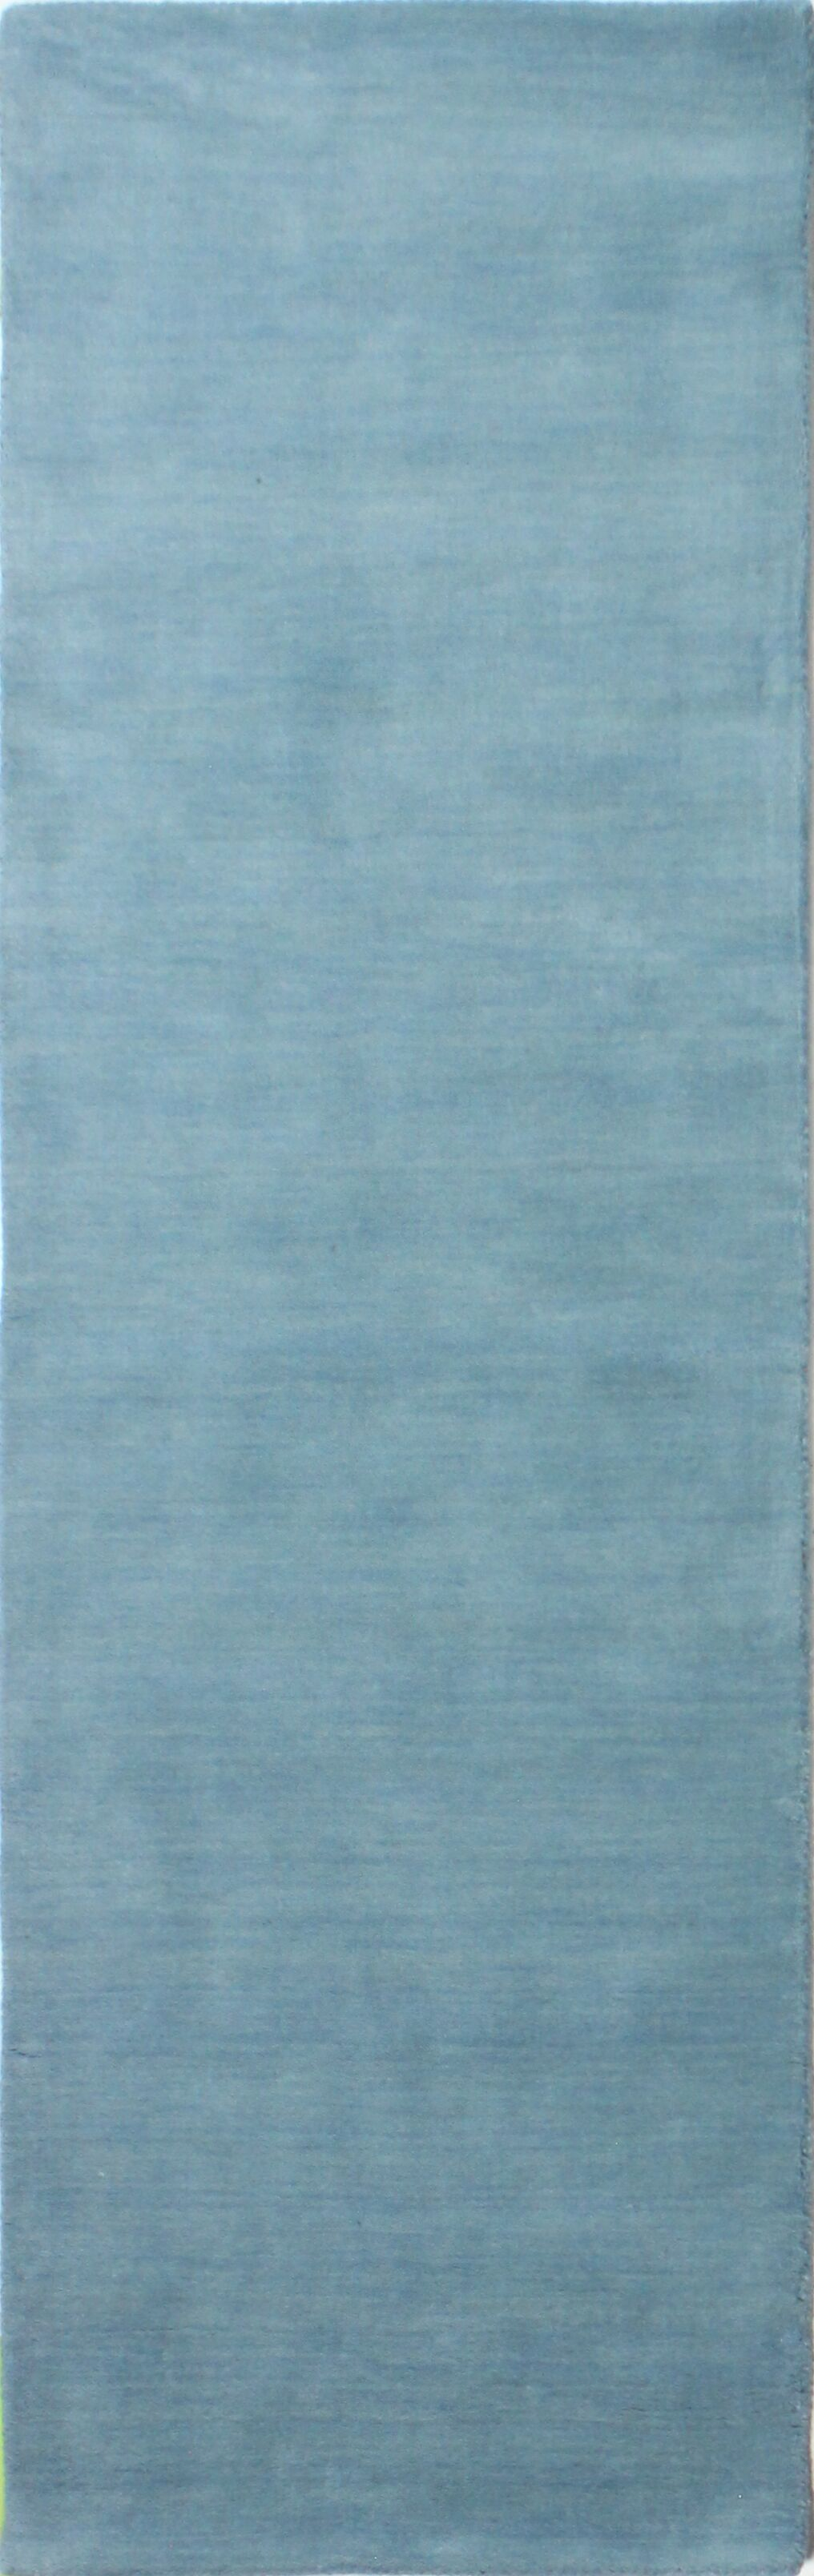 Huslia Hand-Woven Light Blue Area Rug Rug Size: Runner 2'6